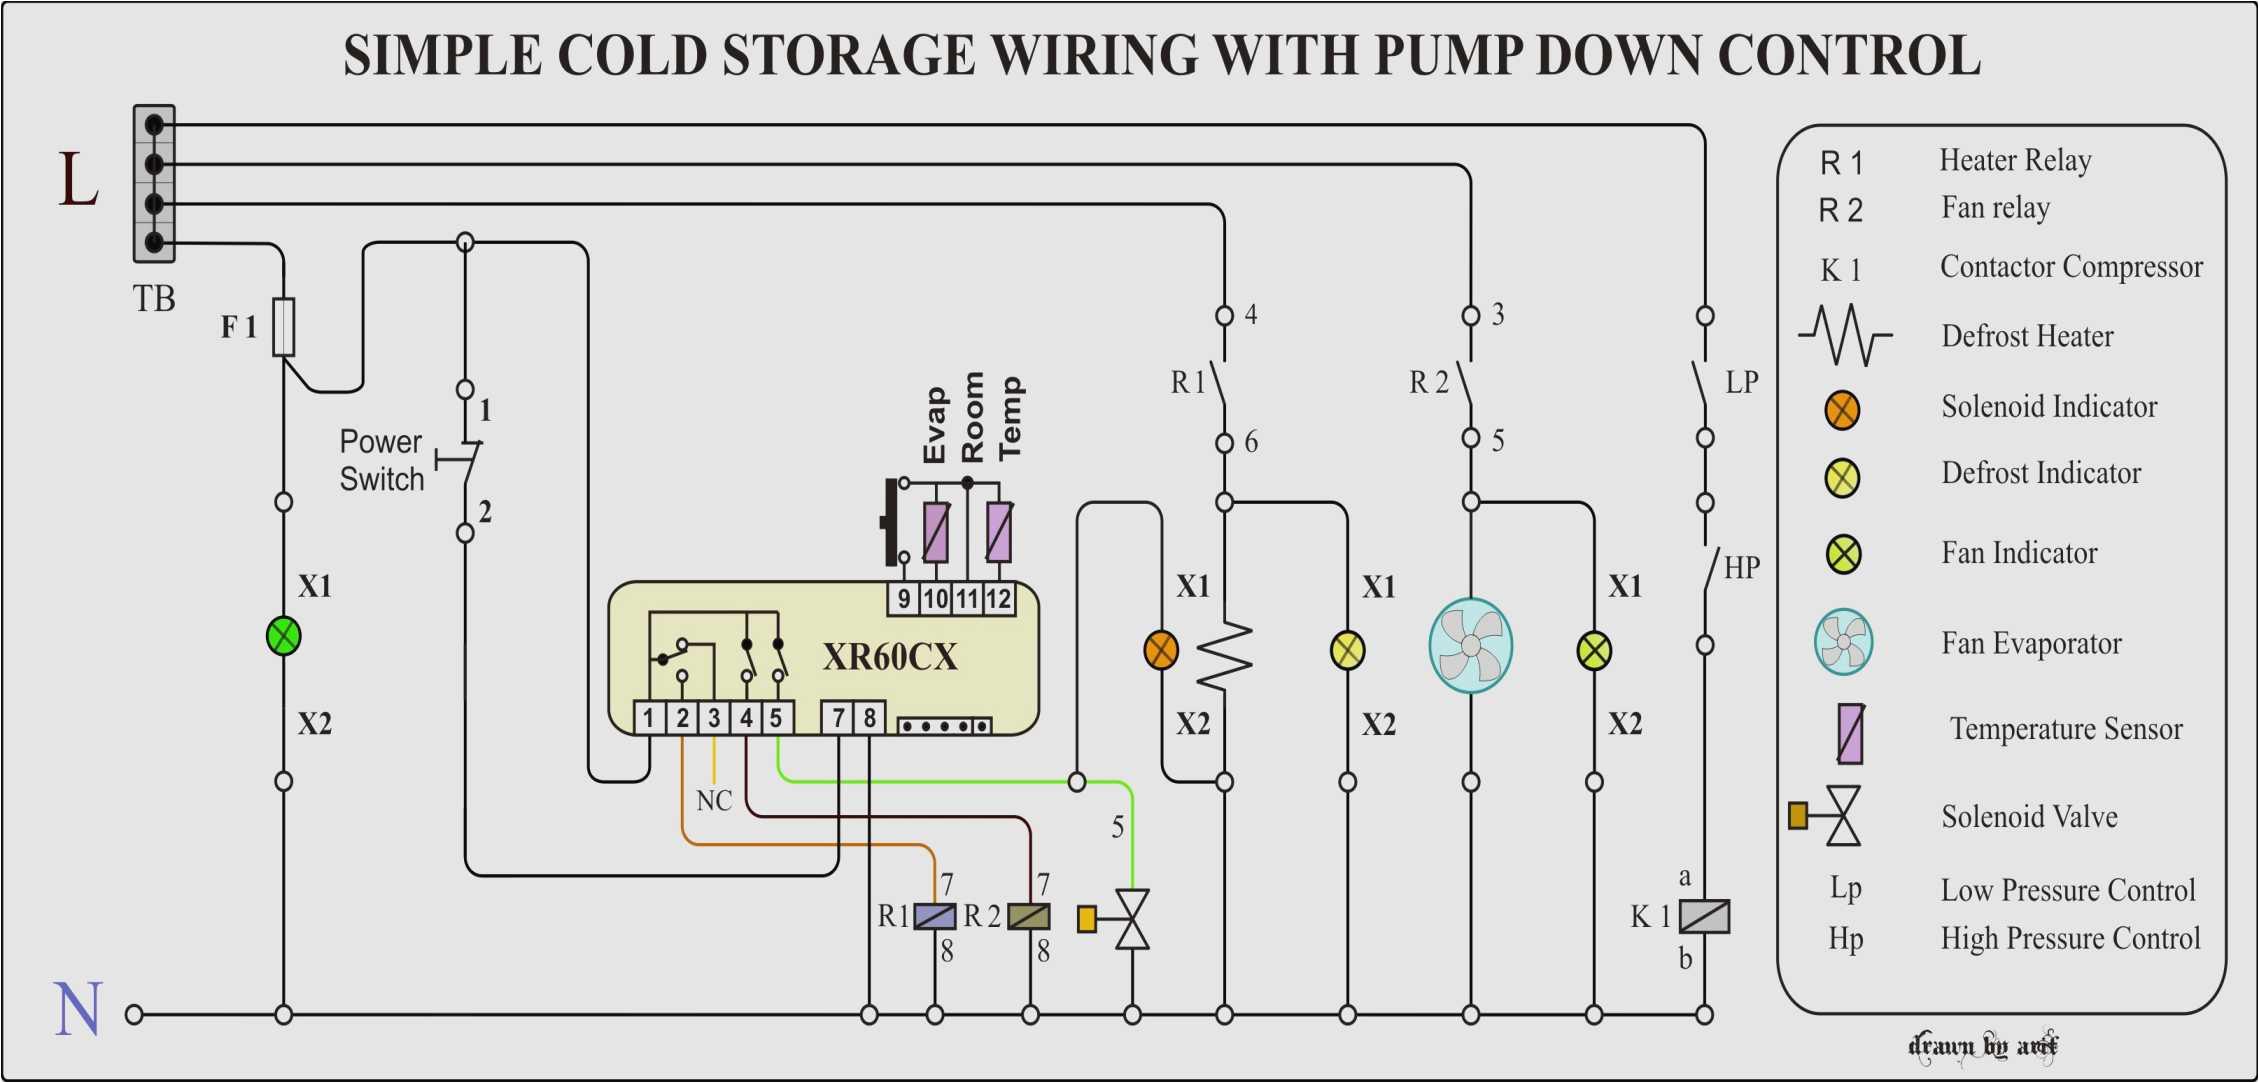 Cold Room Wiring Diagram Pdf Wiring Diagram Pdf Wiring Diagram